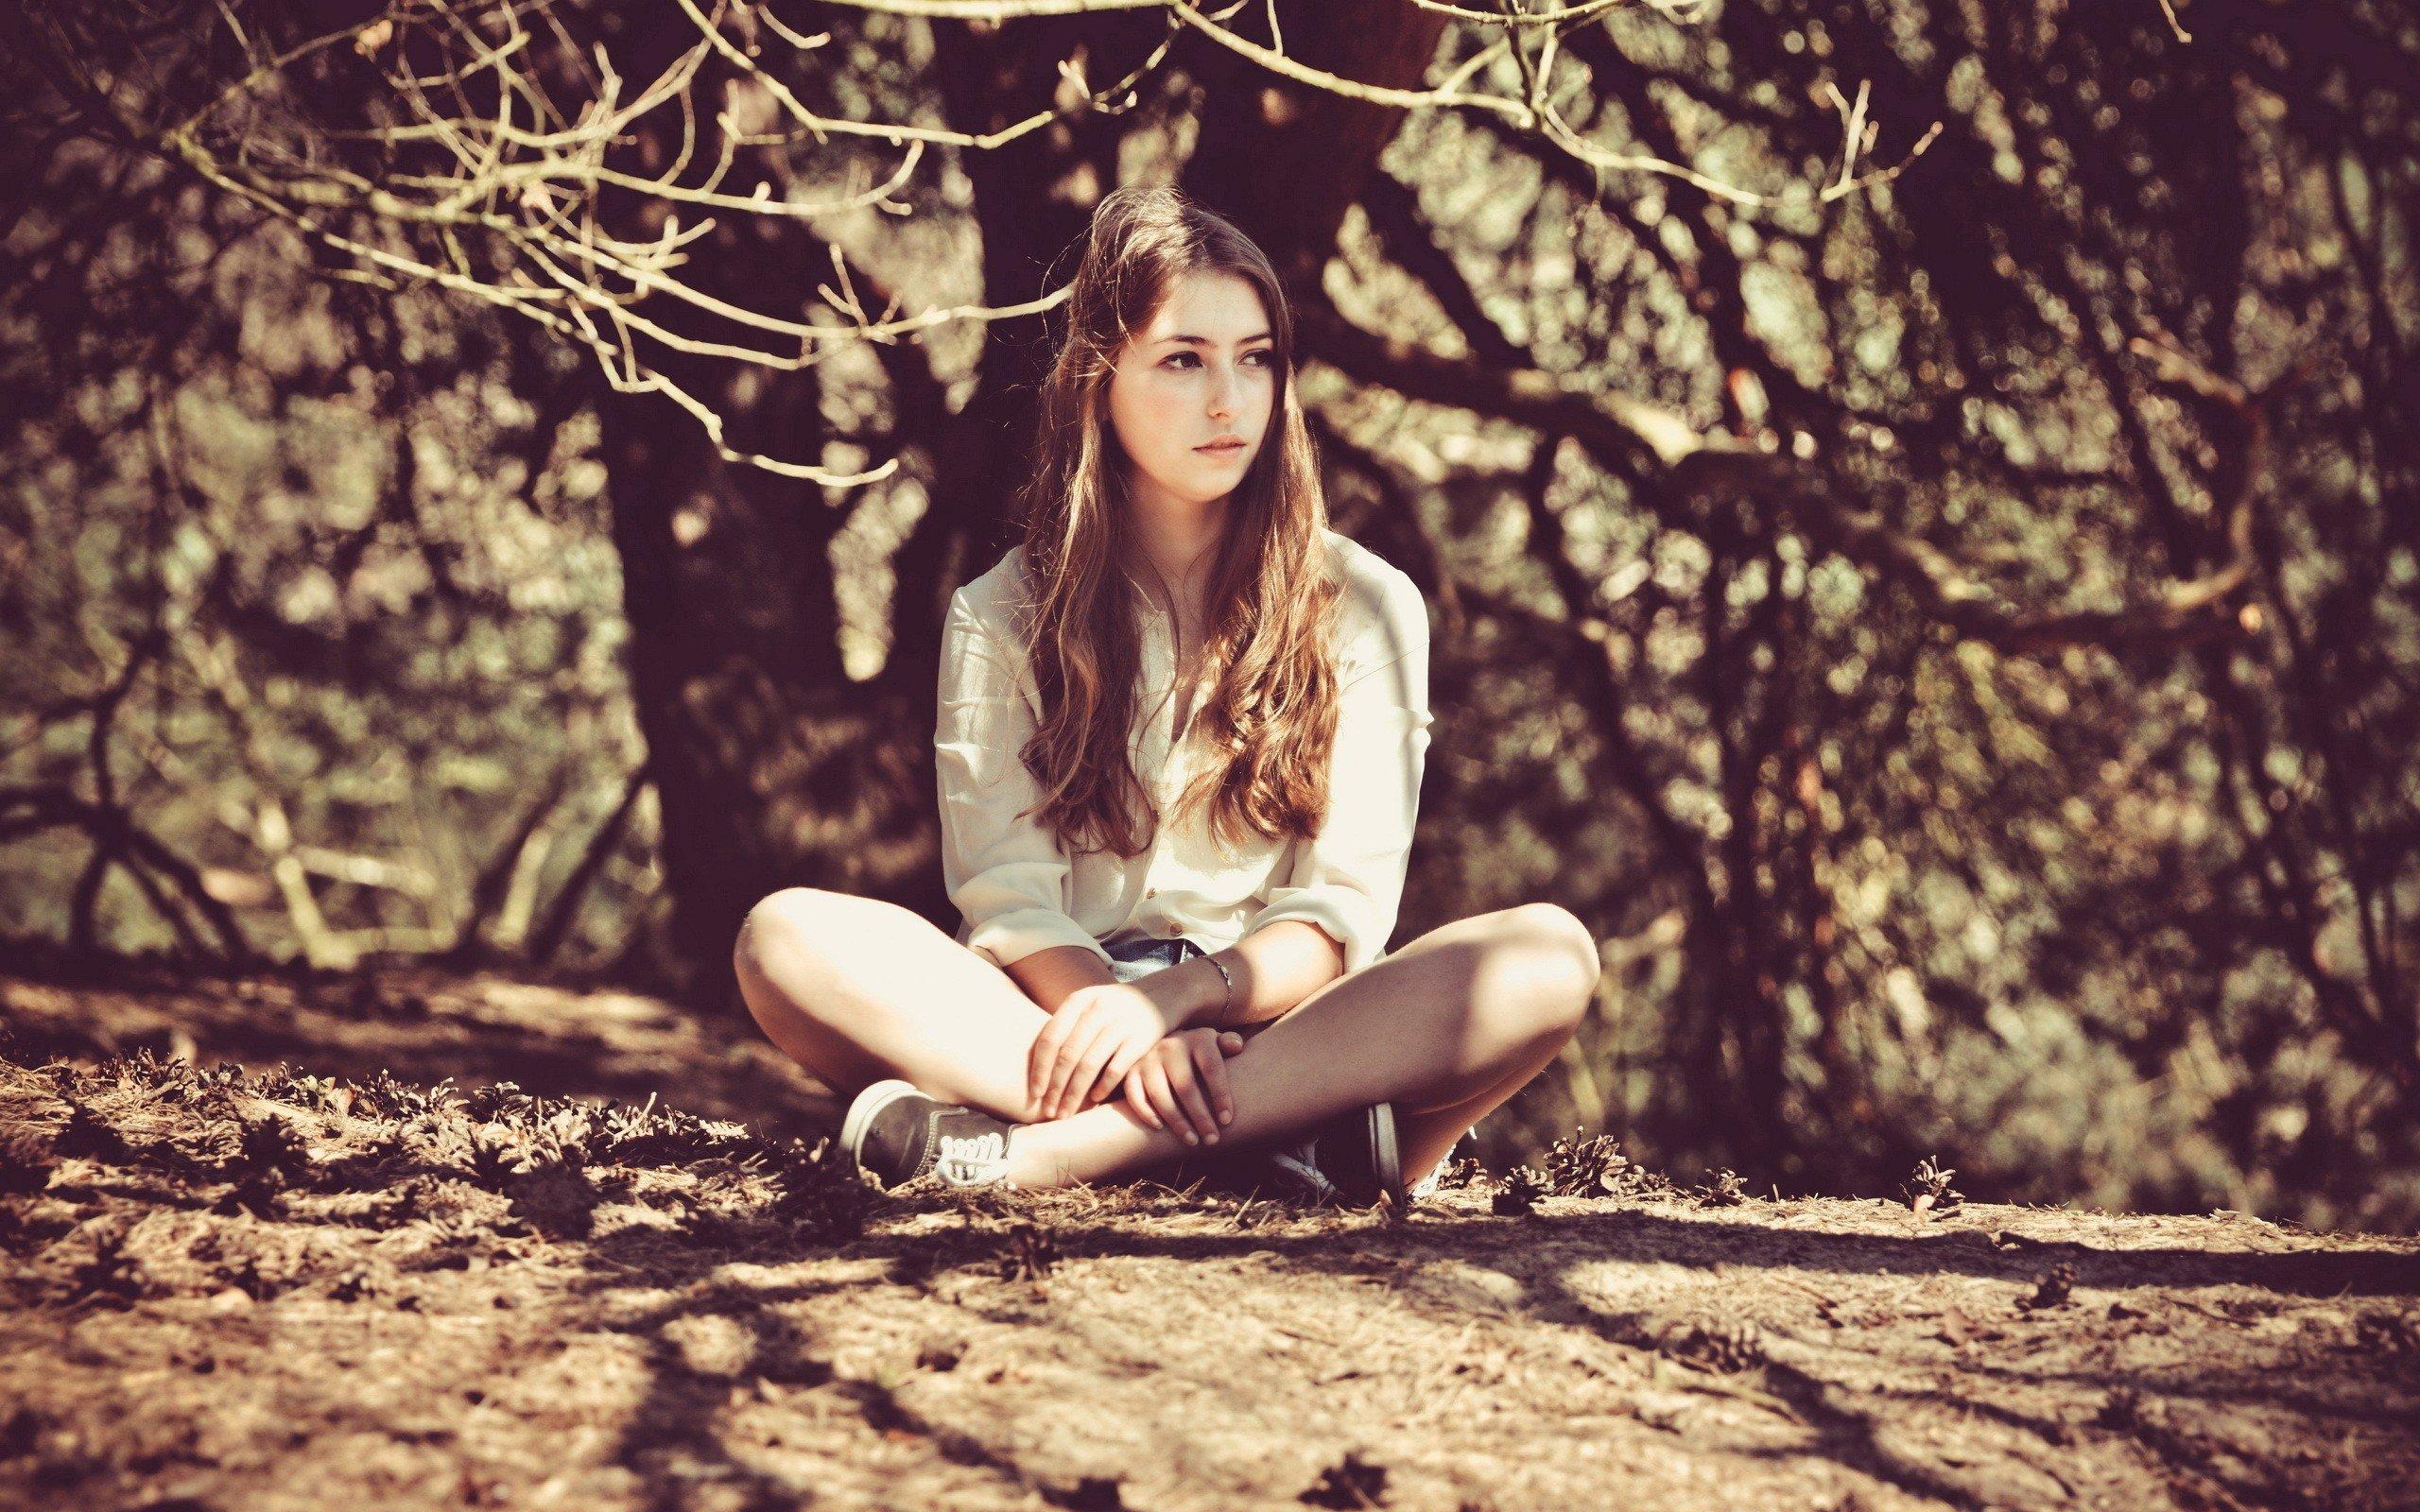 девушка ветка дерево задумчивость girl branch tree thoughtfulness бесплатно